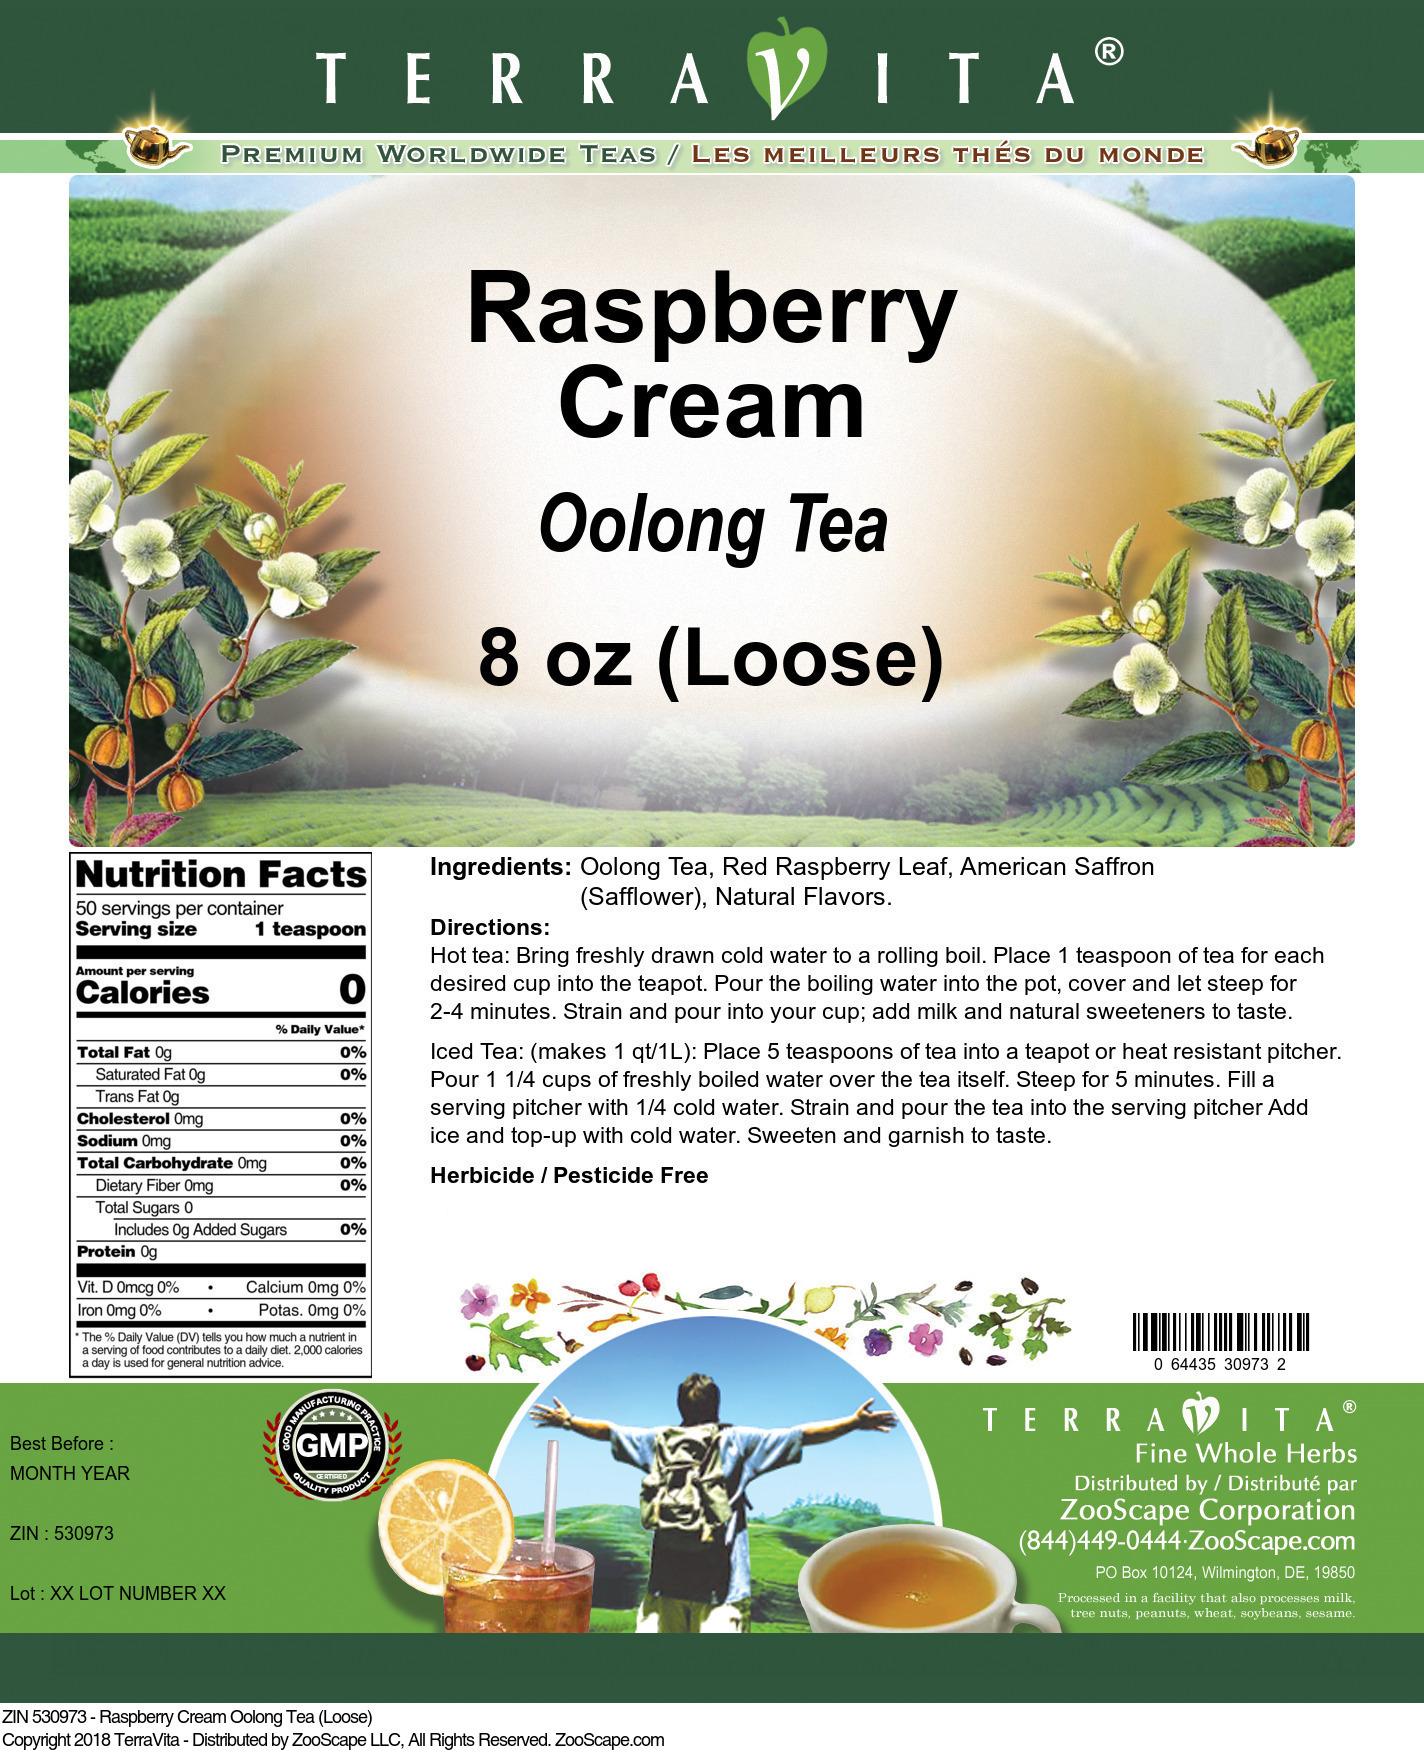 Raspberry Cream Oolong Tea (Loose)